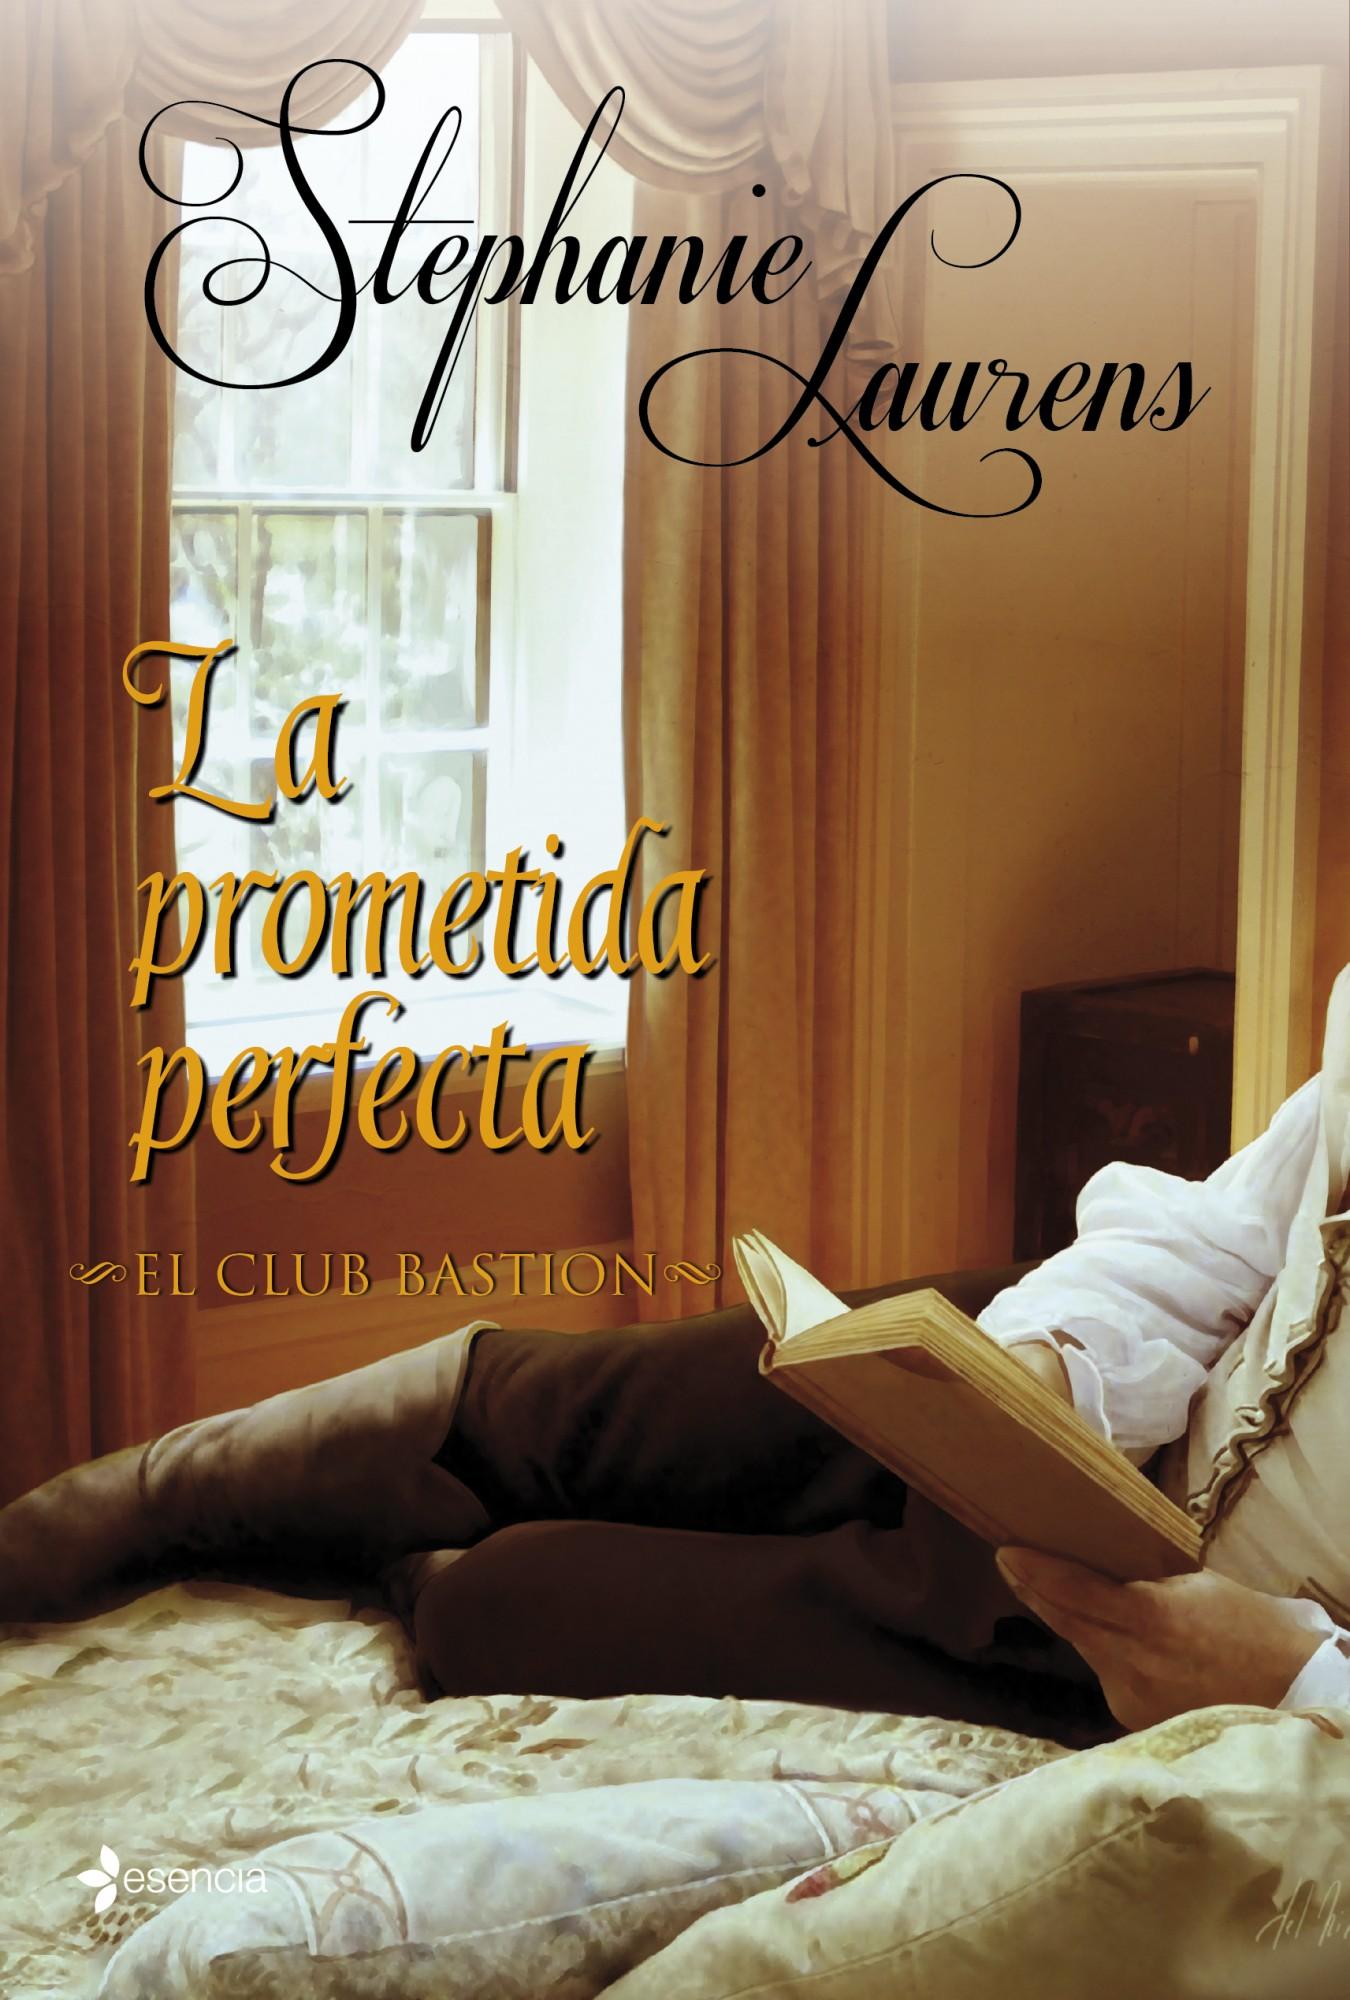 la prometida perfecta  (el club bastion 1)-stephanie laurens-9788408109792